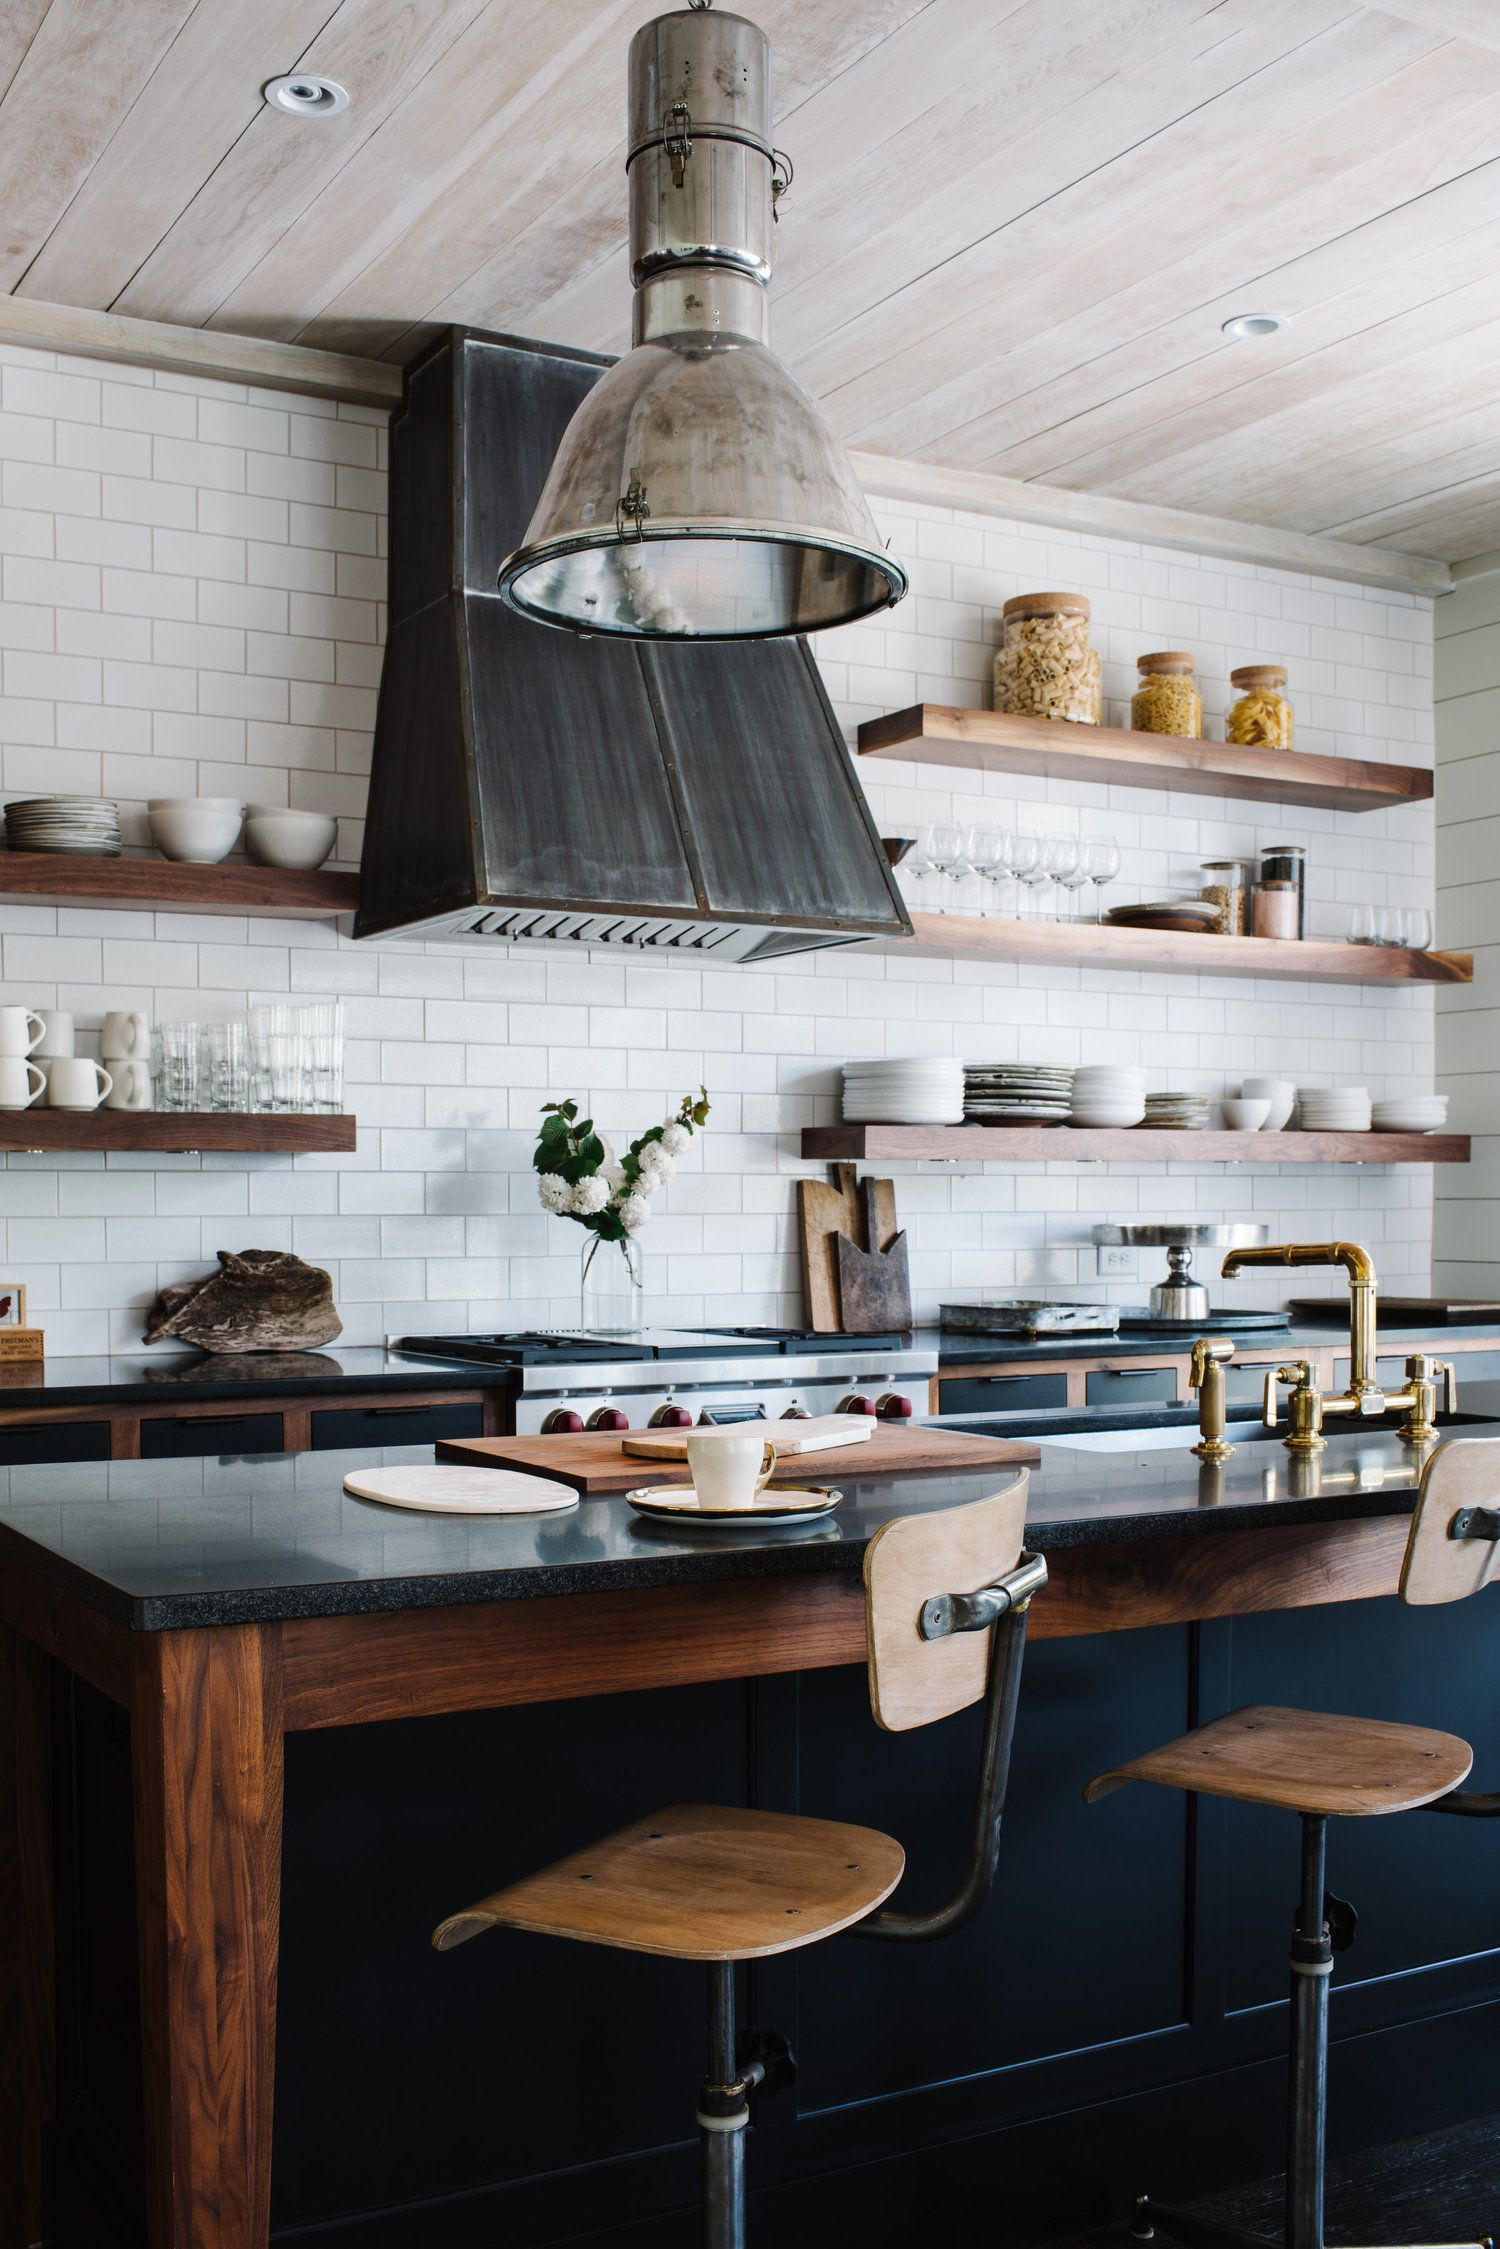 Pin by kelsey goodrich on n e s t pinterest kitchens modern